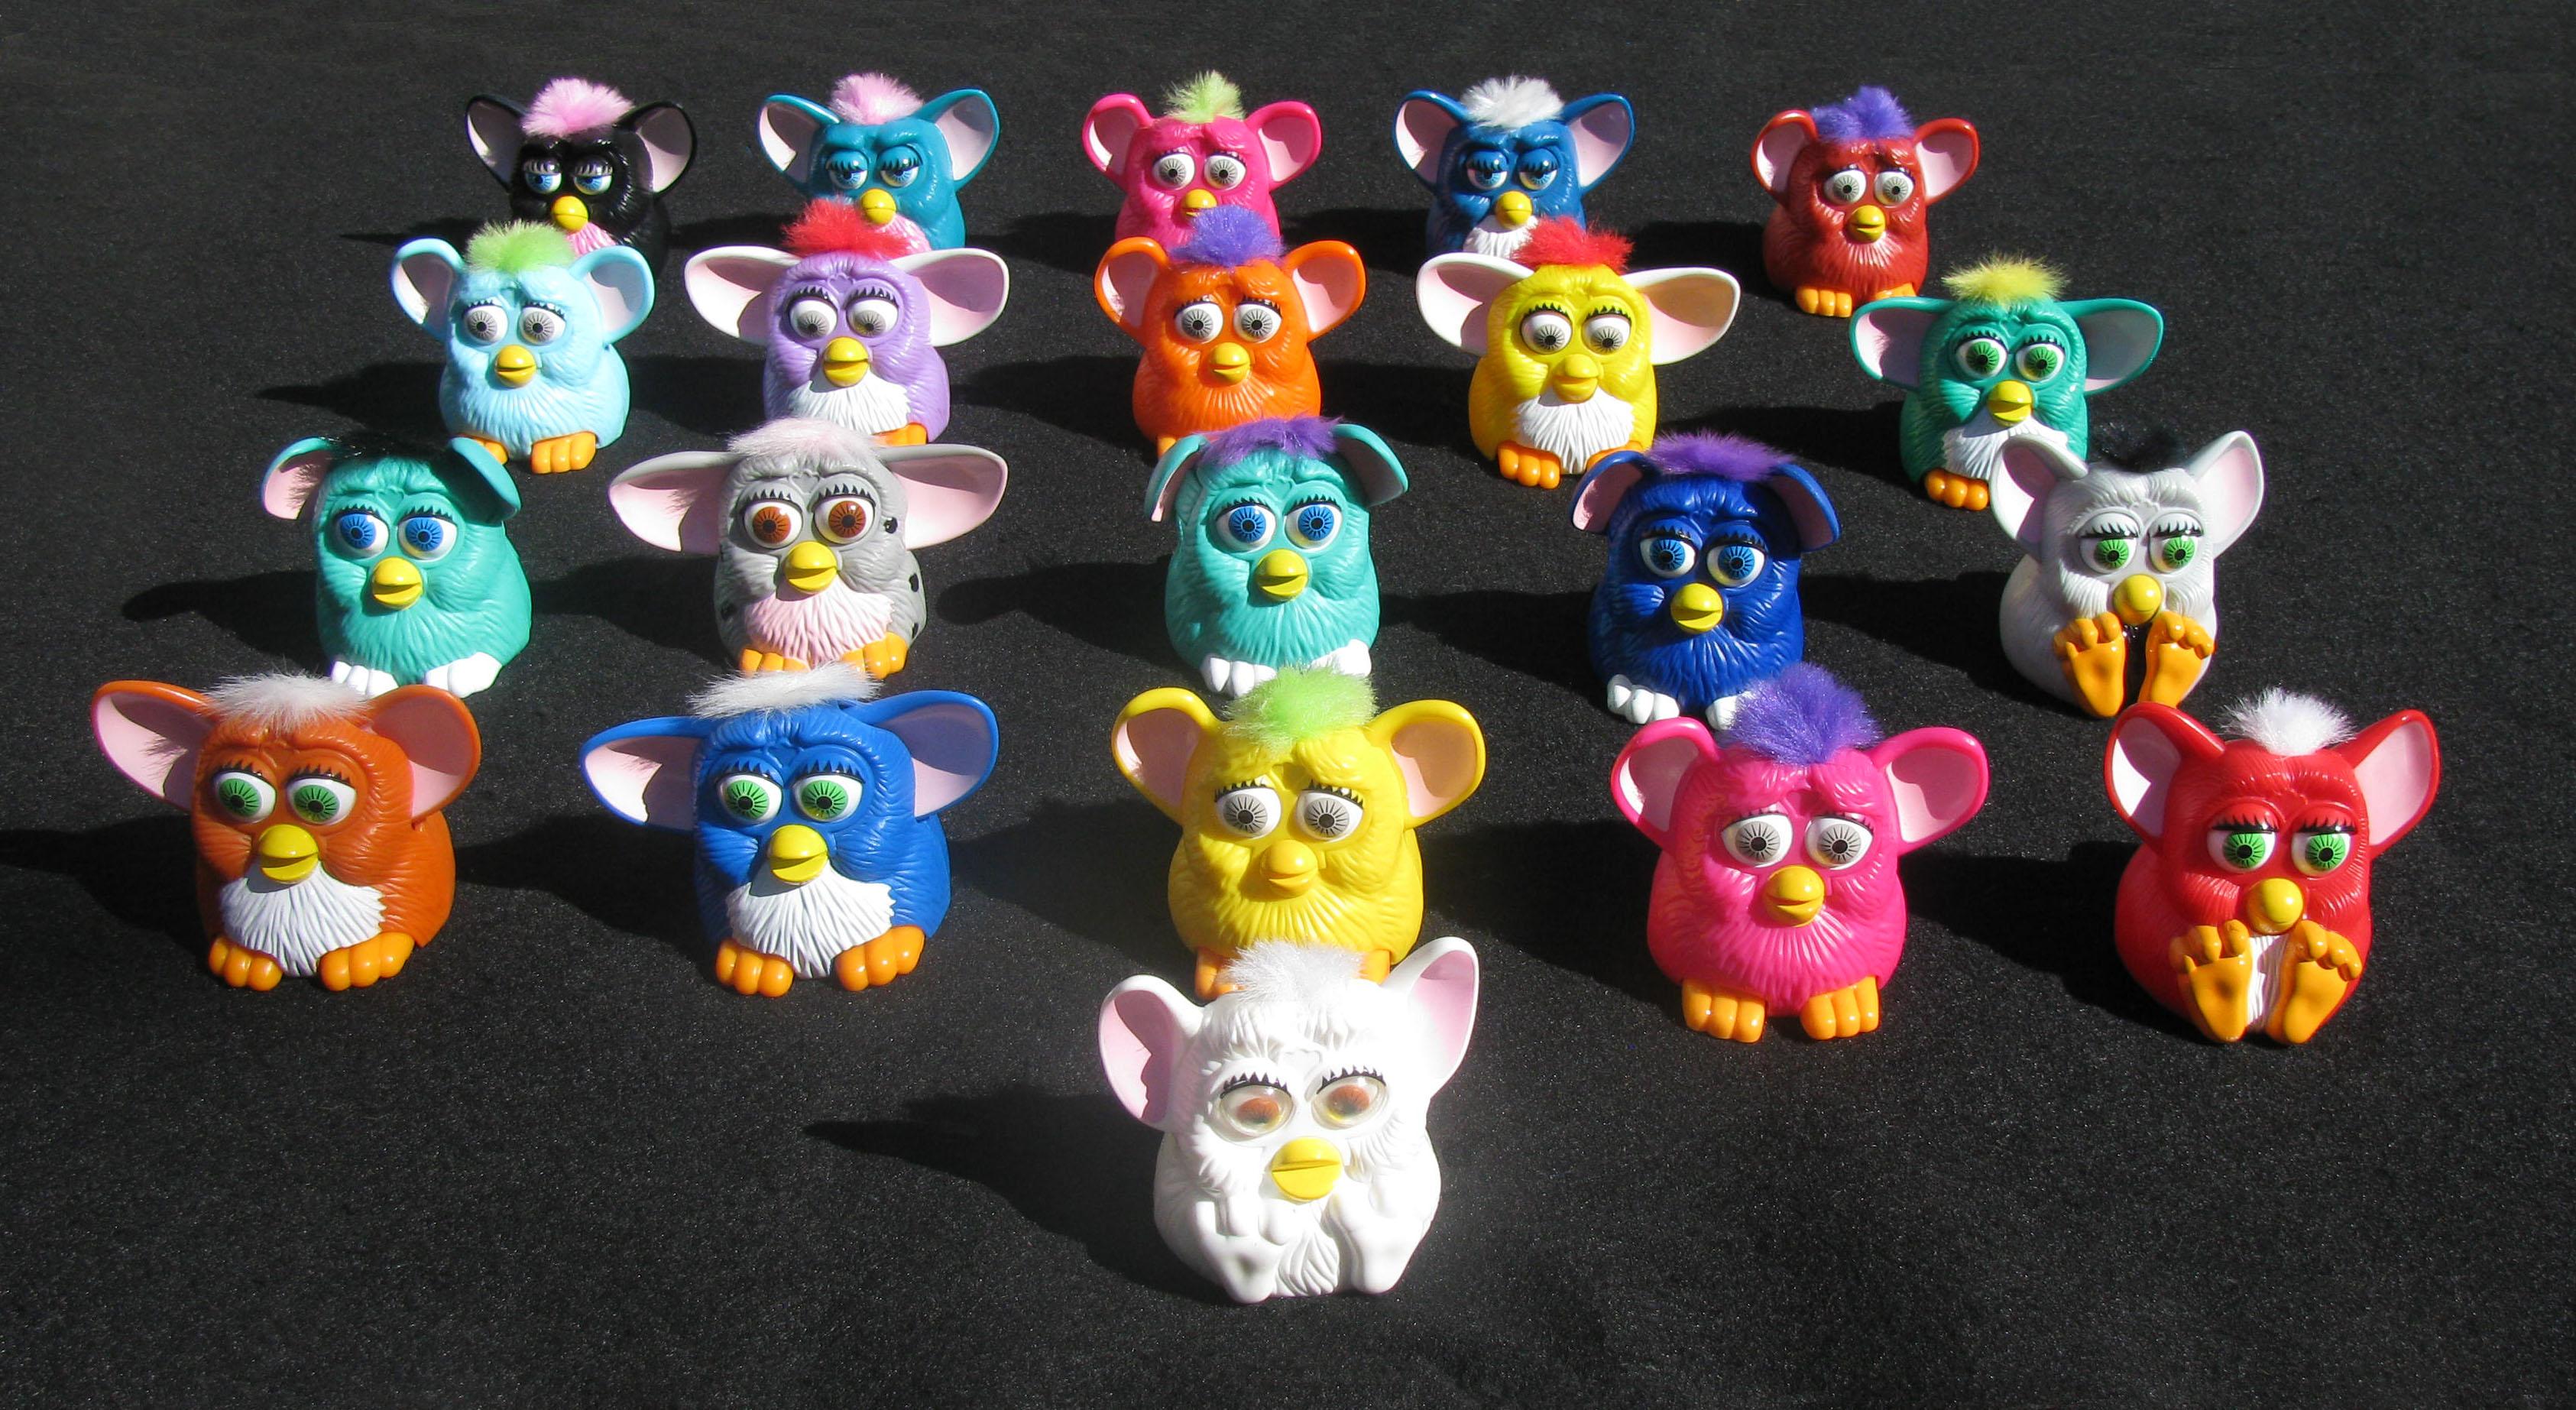 mini-furby-toys-mcdonald's